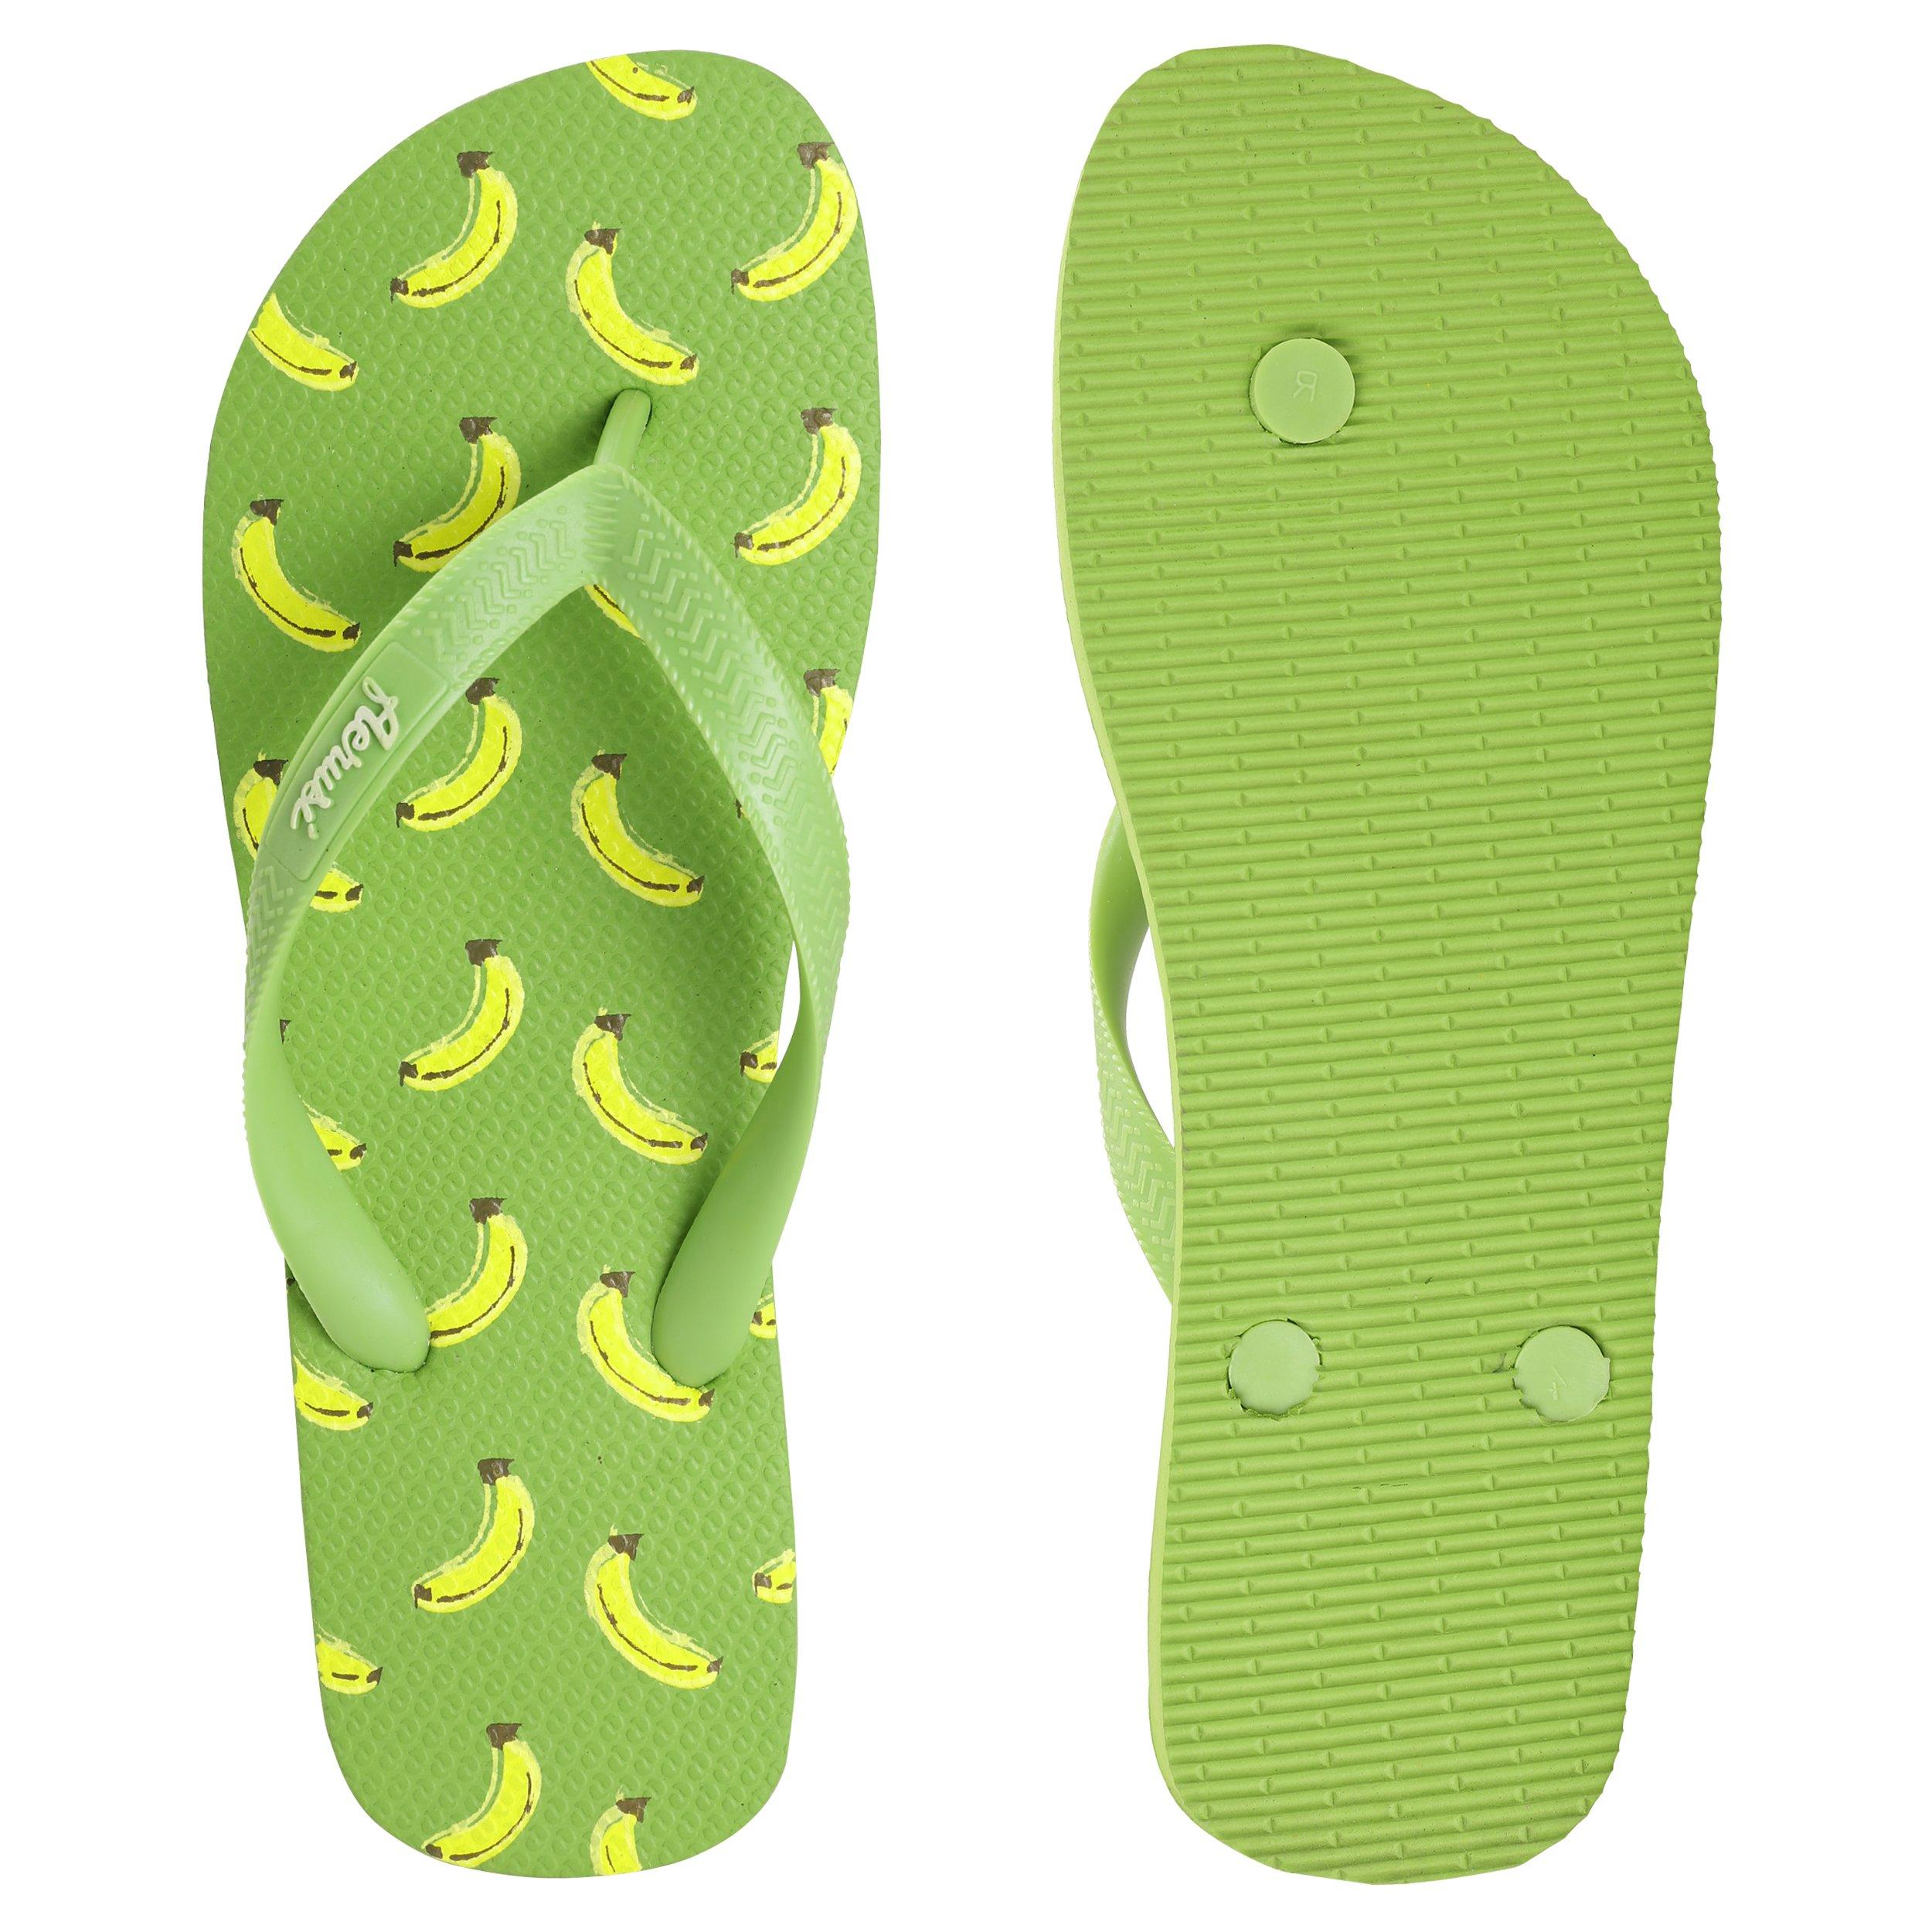 d34b48b4e Aerusi SEG083039 Ocean Corte Series Banana Design Flip Flop Sandal Slippers